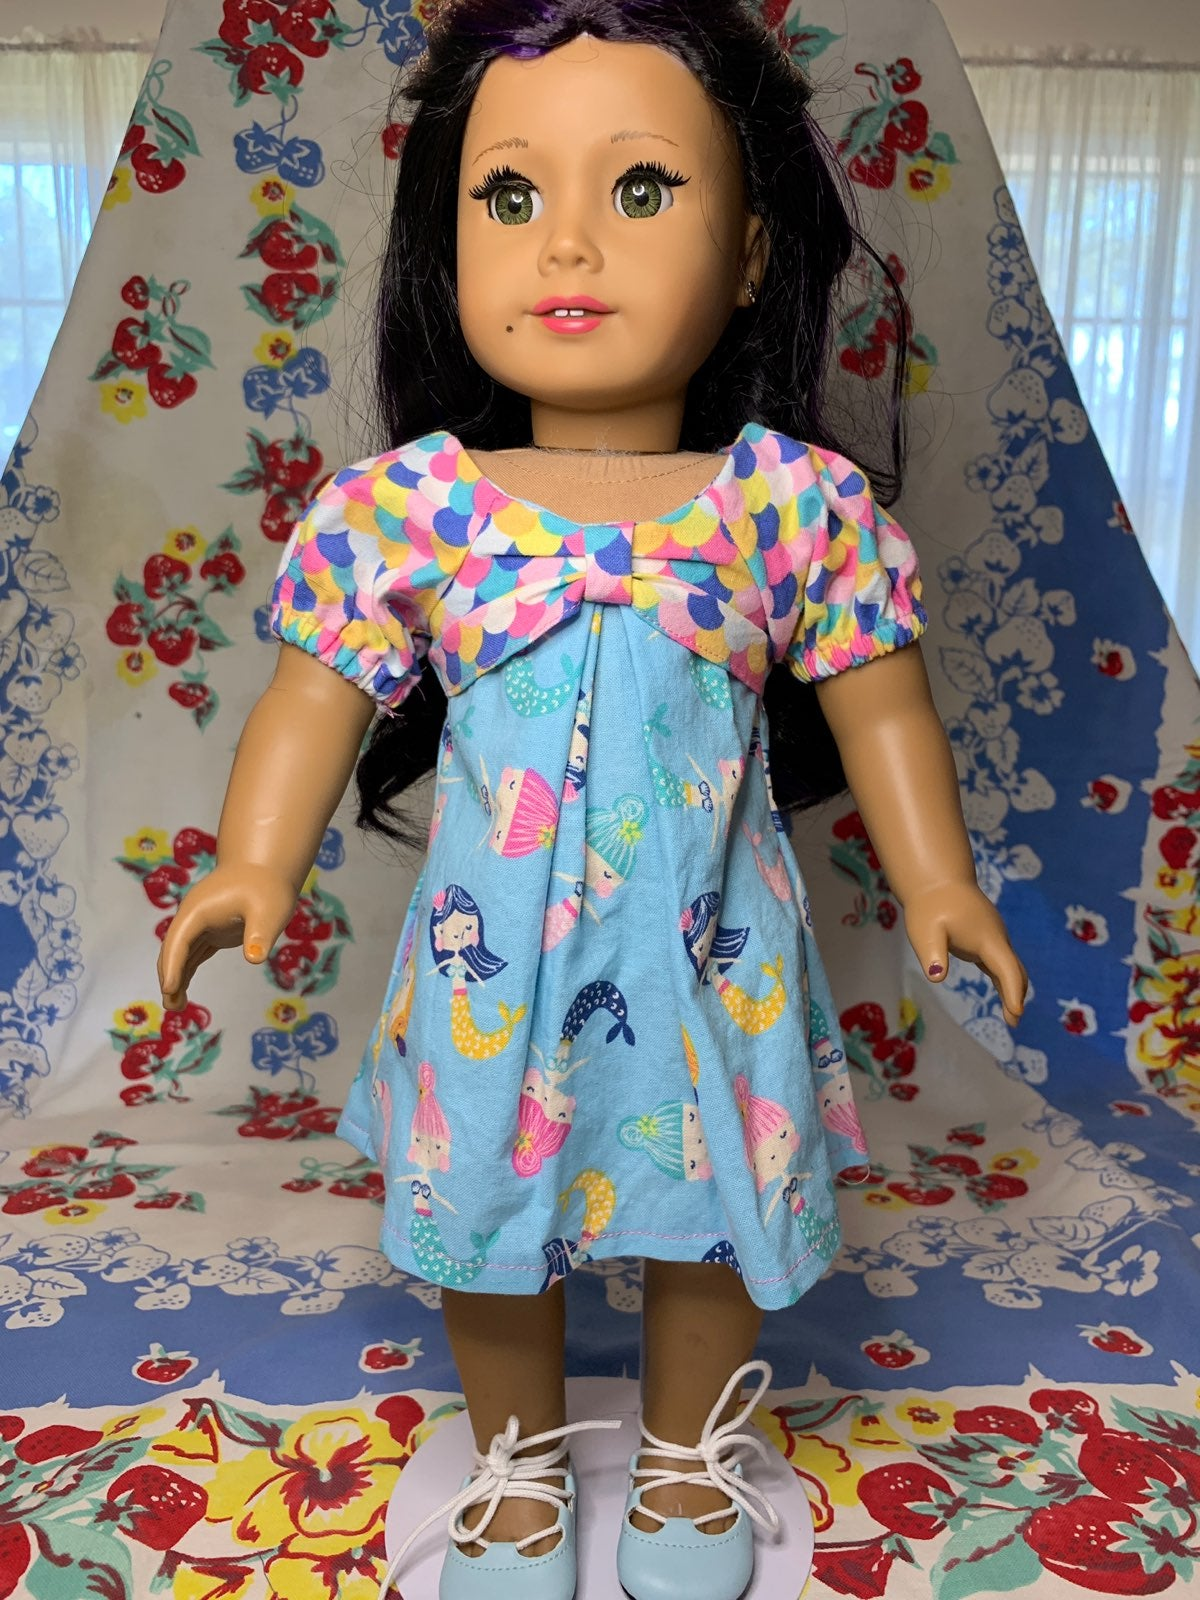 18 Inch Doll Dress Fits American Girl